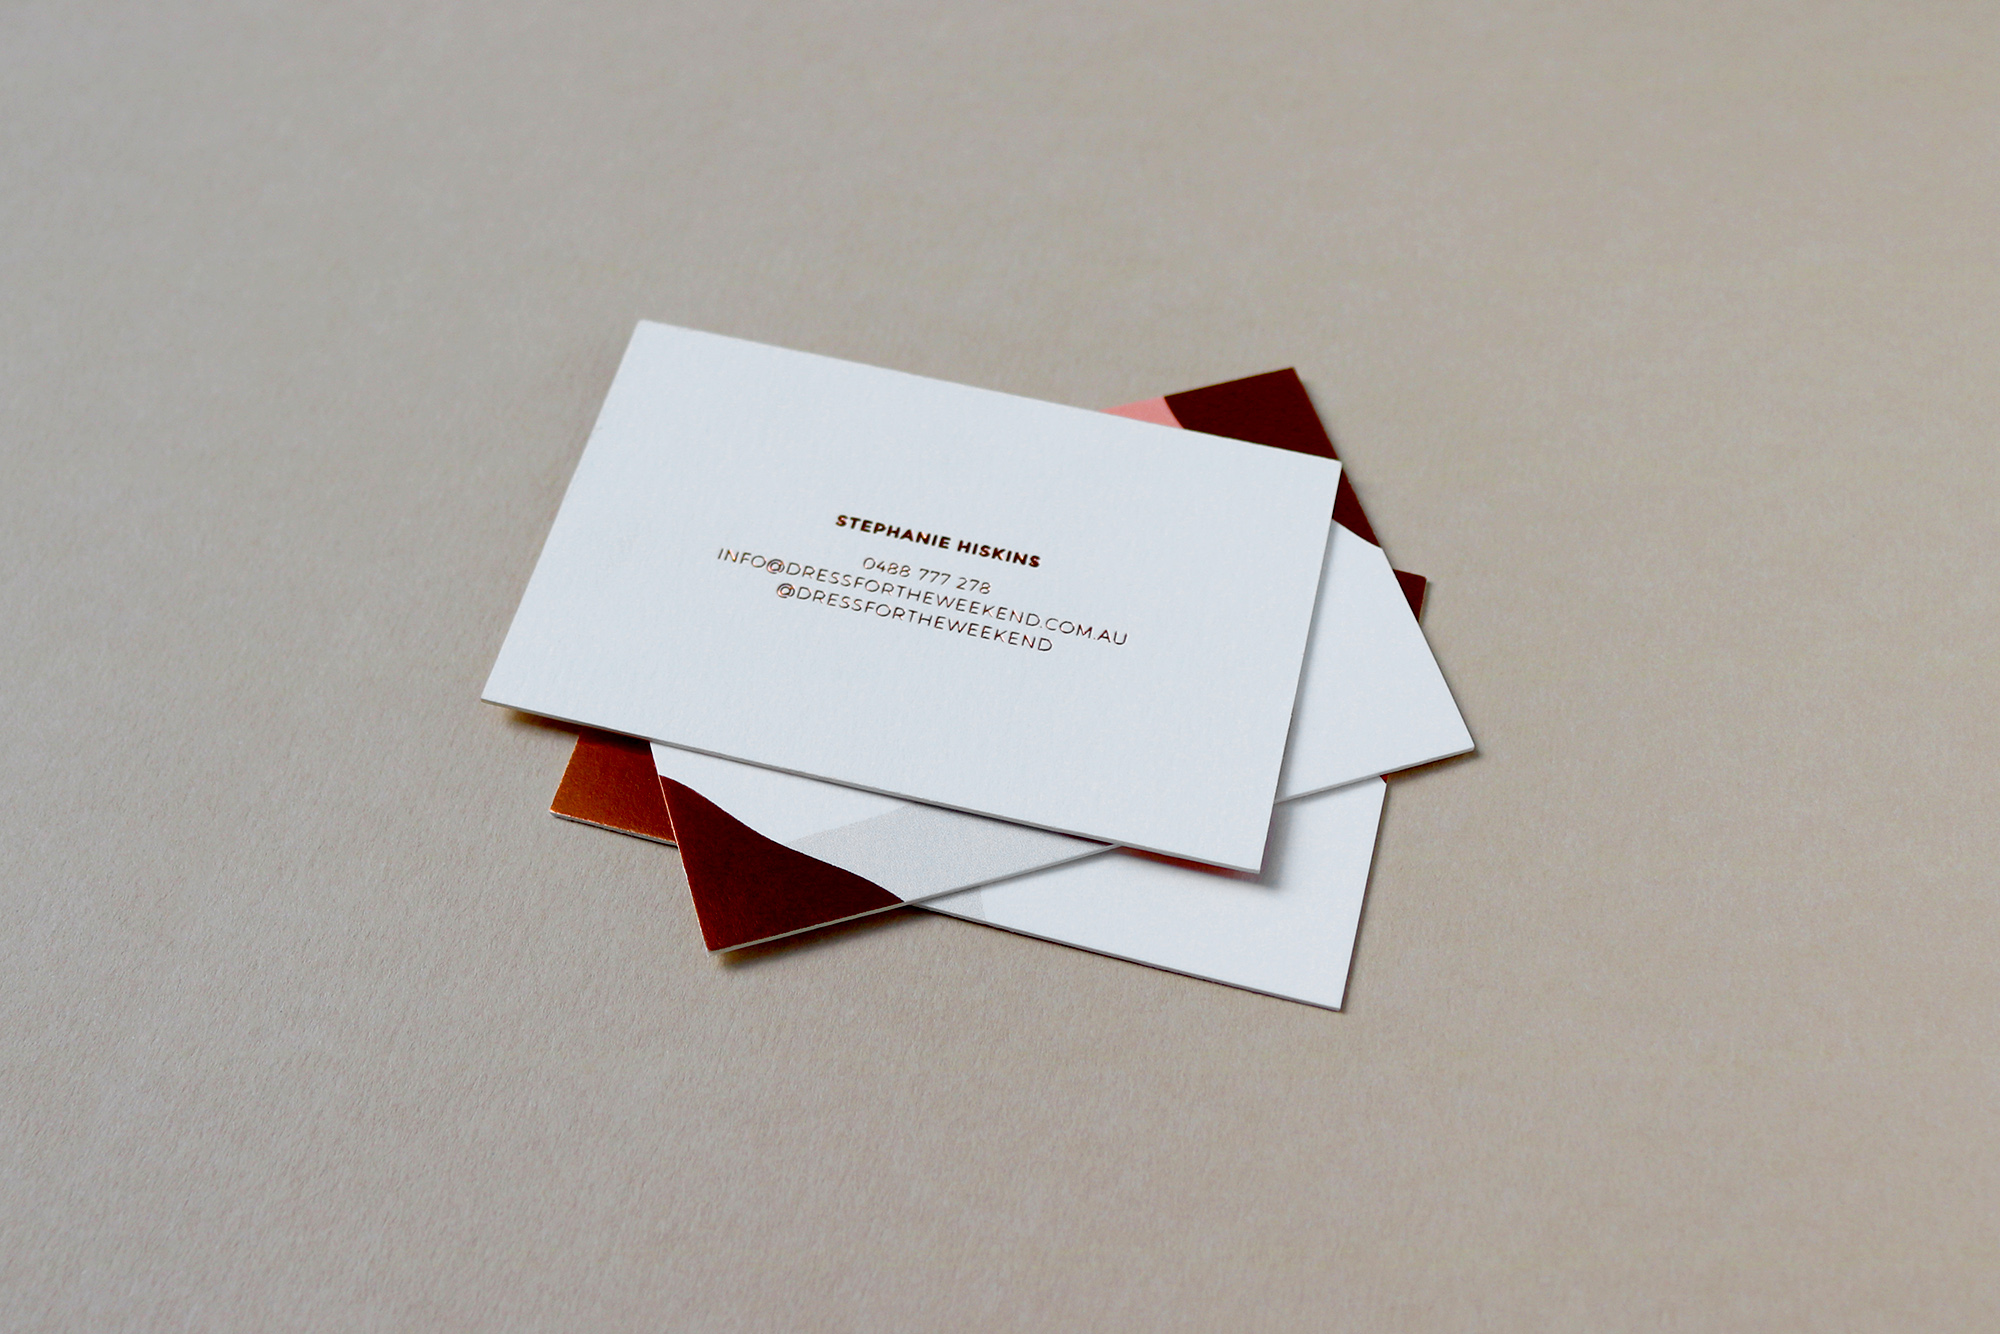 DFTW Business Card design + Copper Foil